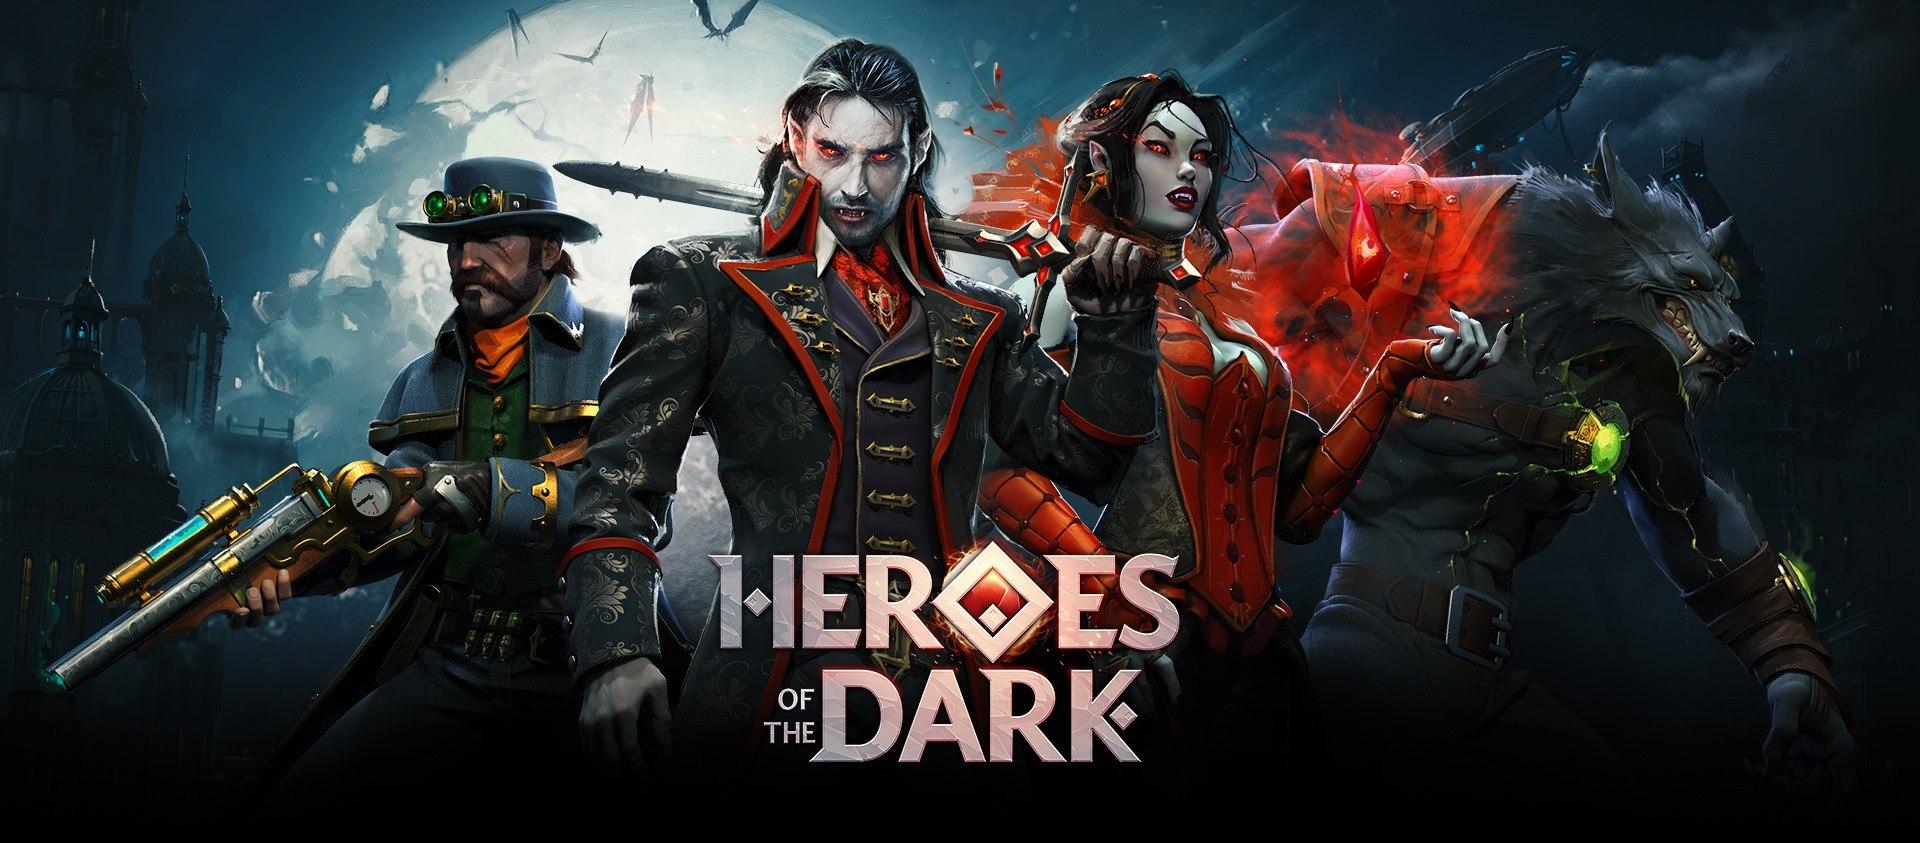 Heroes of the Dark Open Pre-Registrations Ahead of Worldwide Launch